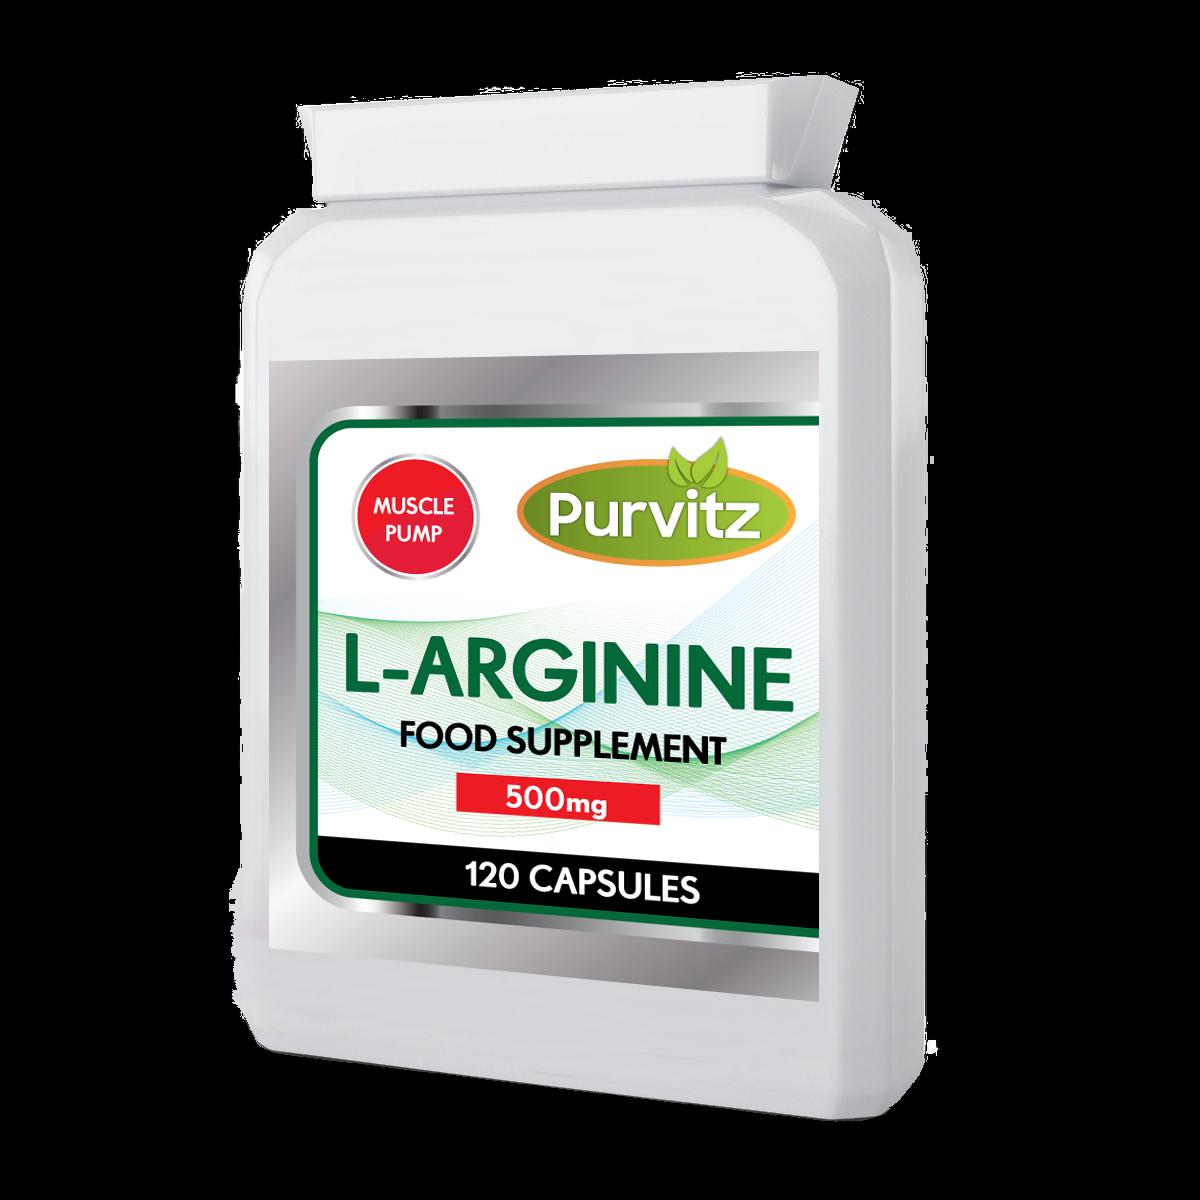 L-Arginine HCL 500mg Argi 120 Capsules L Arginine Nitric Oxide Increase Pump UK